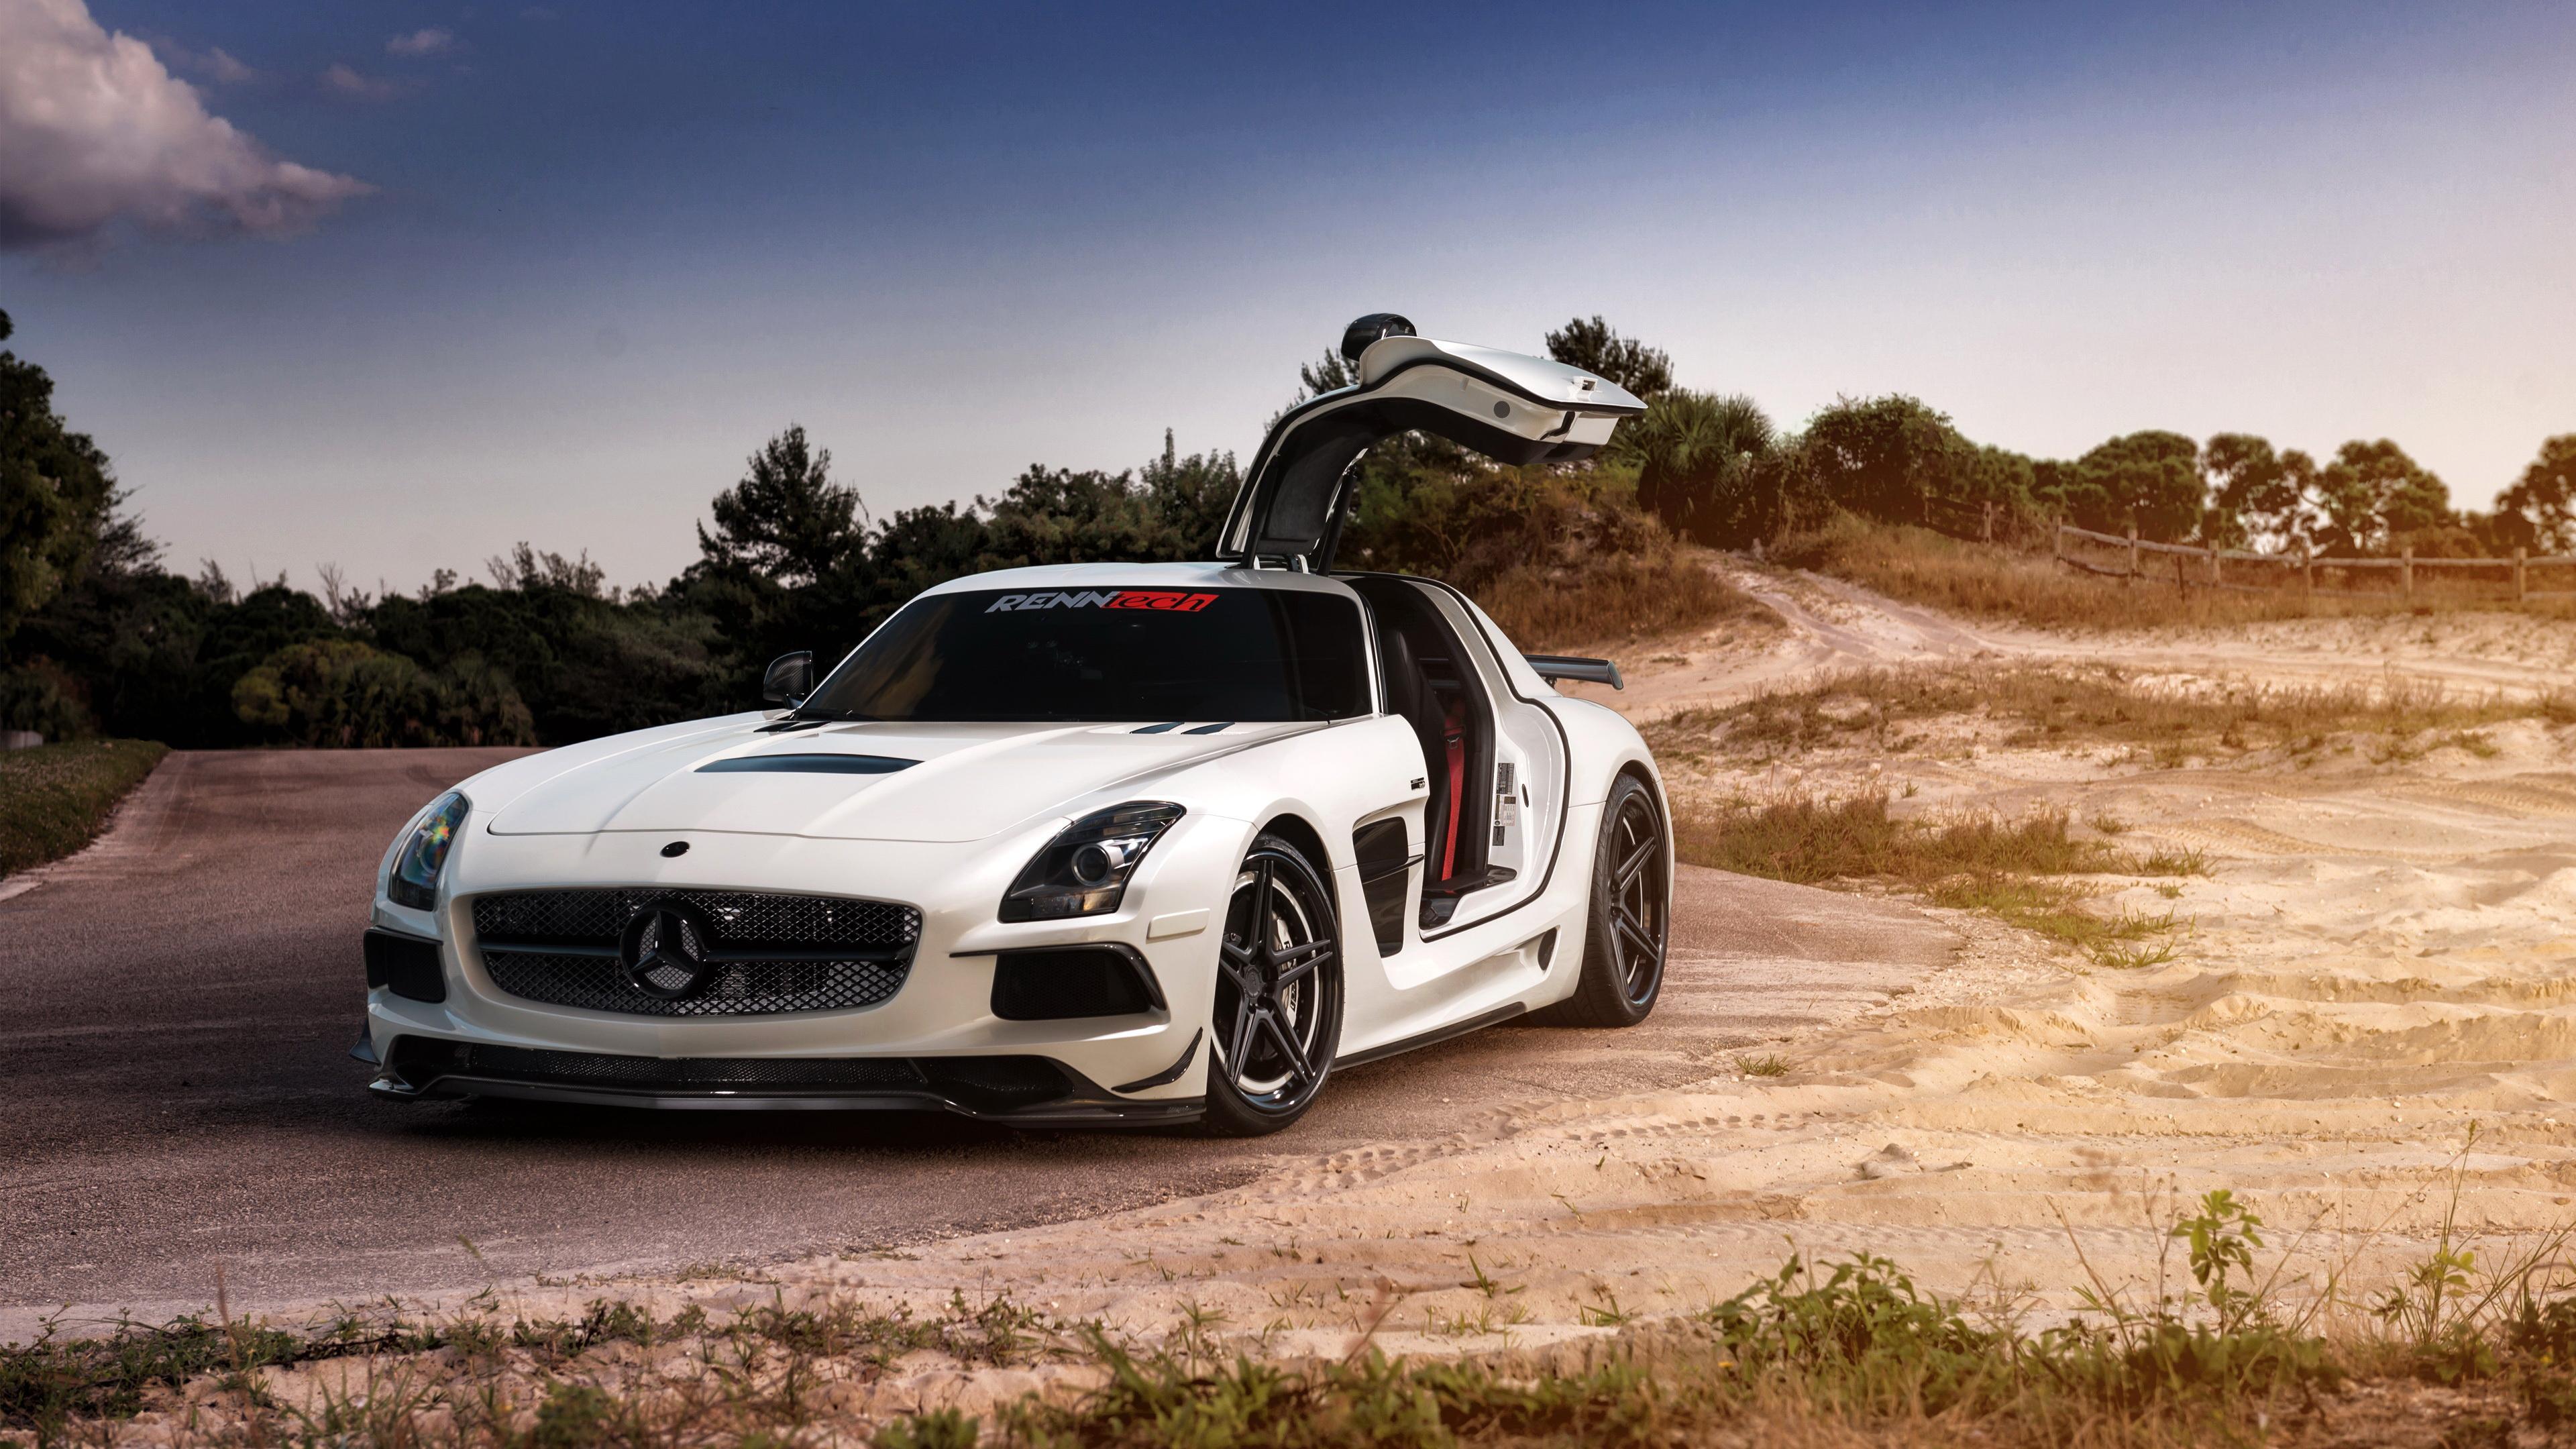 Mercedes Sls Amg 4k Hd Cars 4k Wallpapers Images